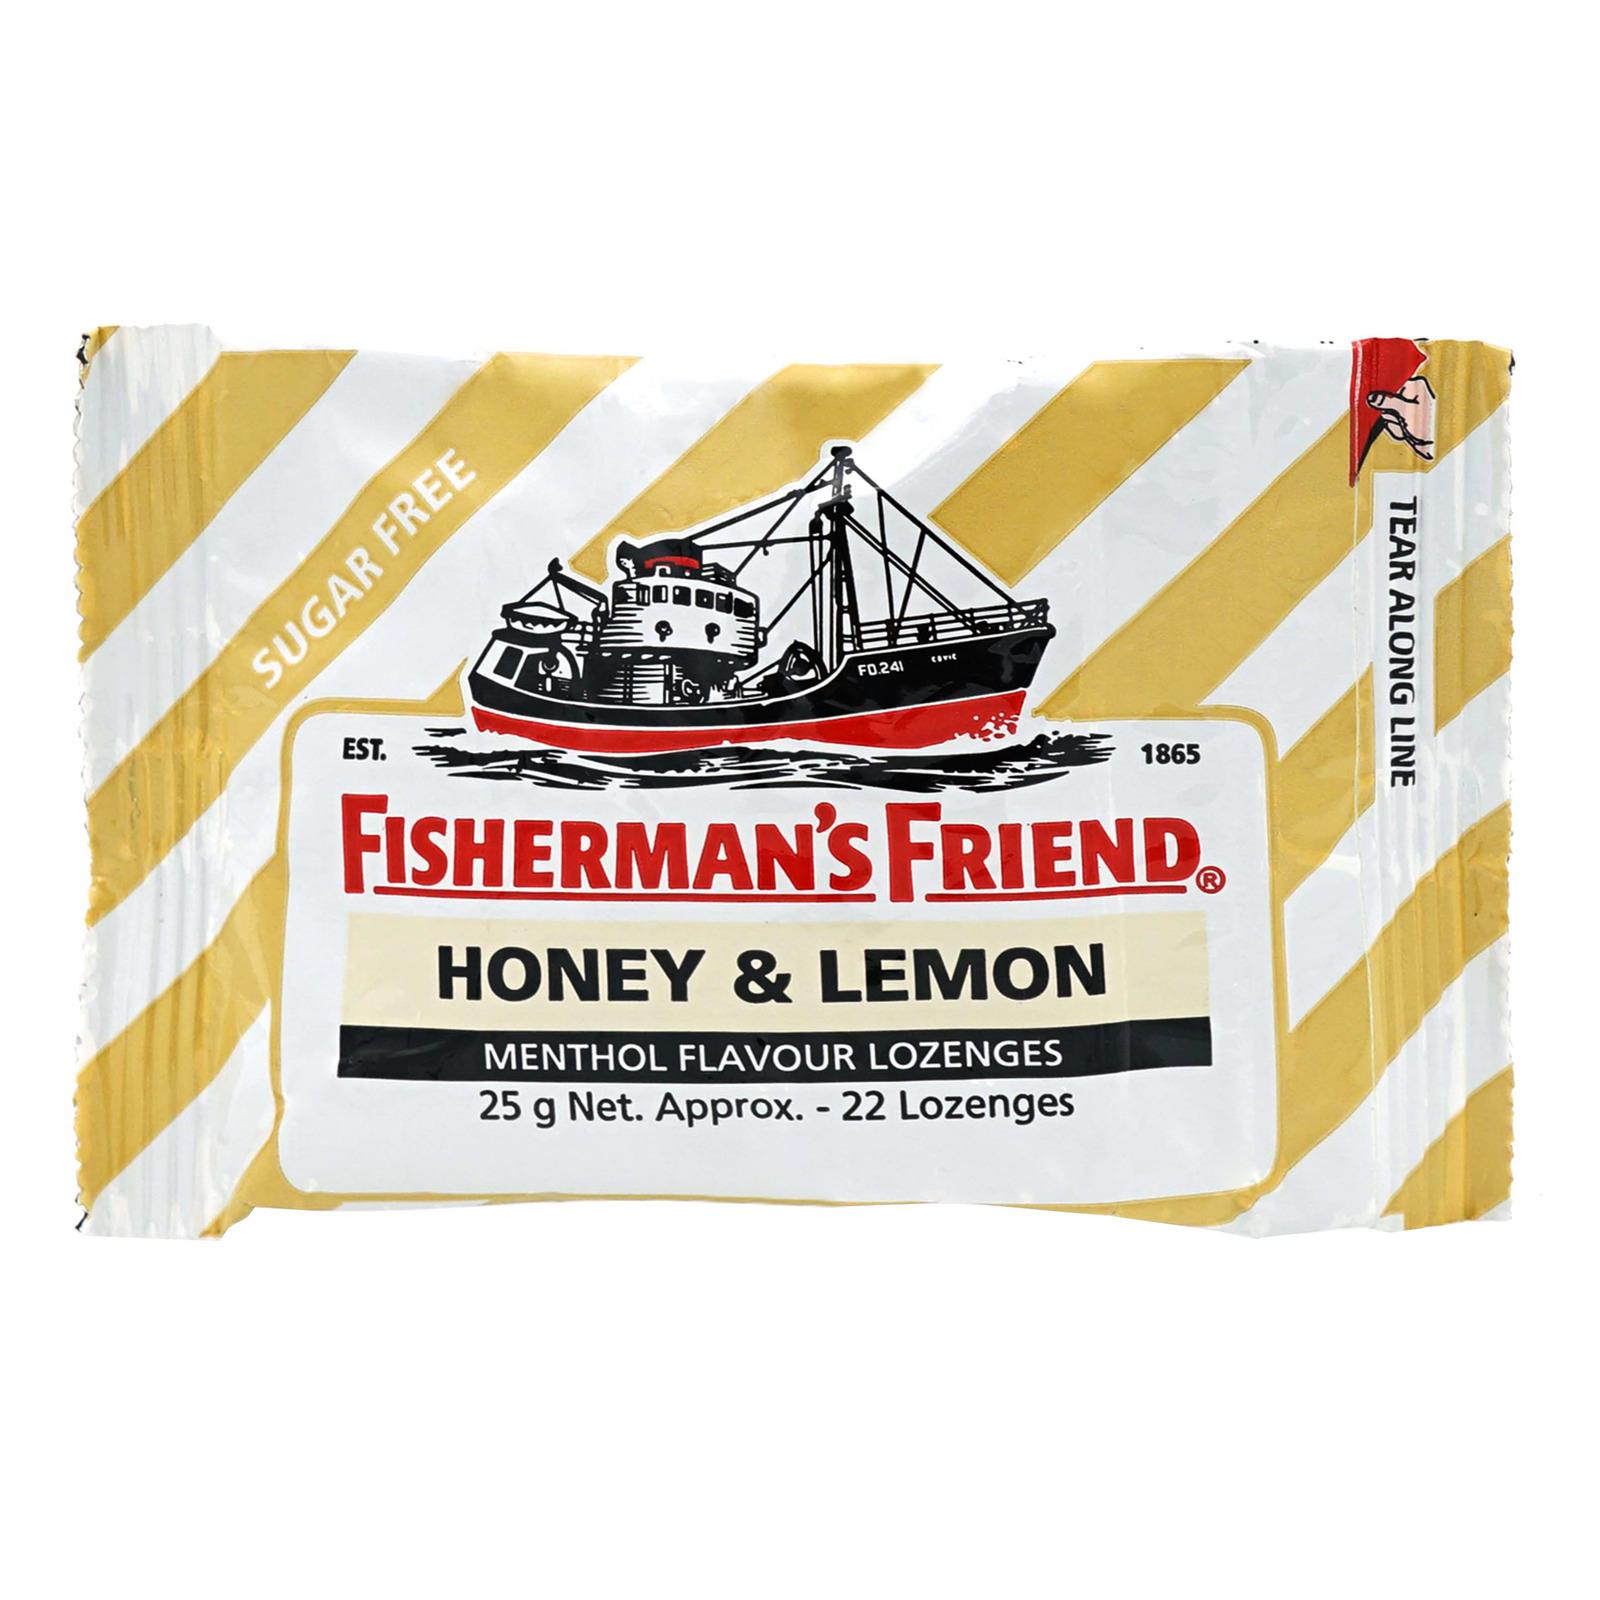 Fisherman's Friend Sugar Free Lozenges - Honey & Lemon